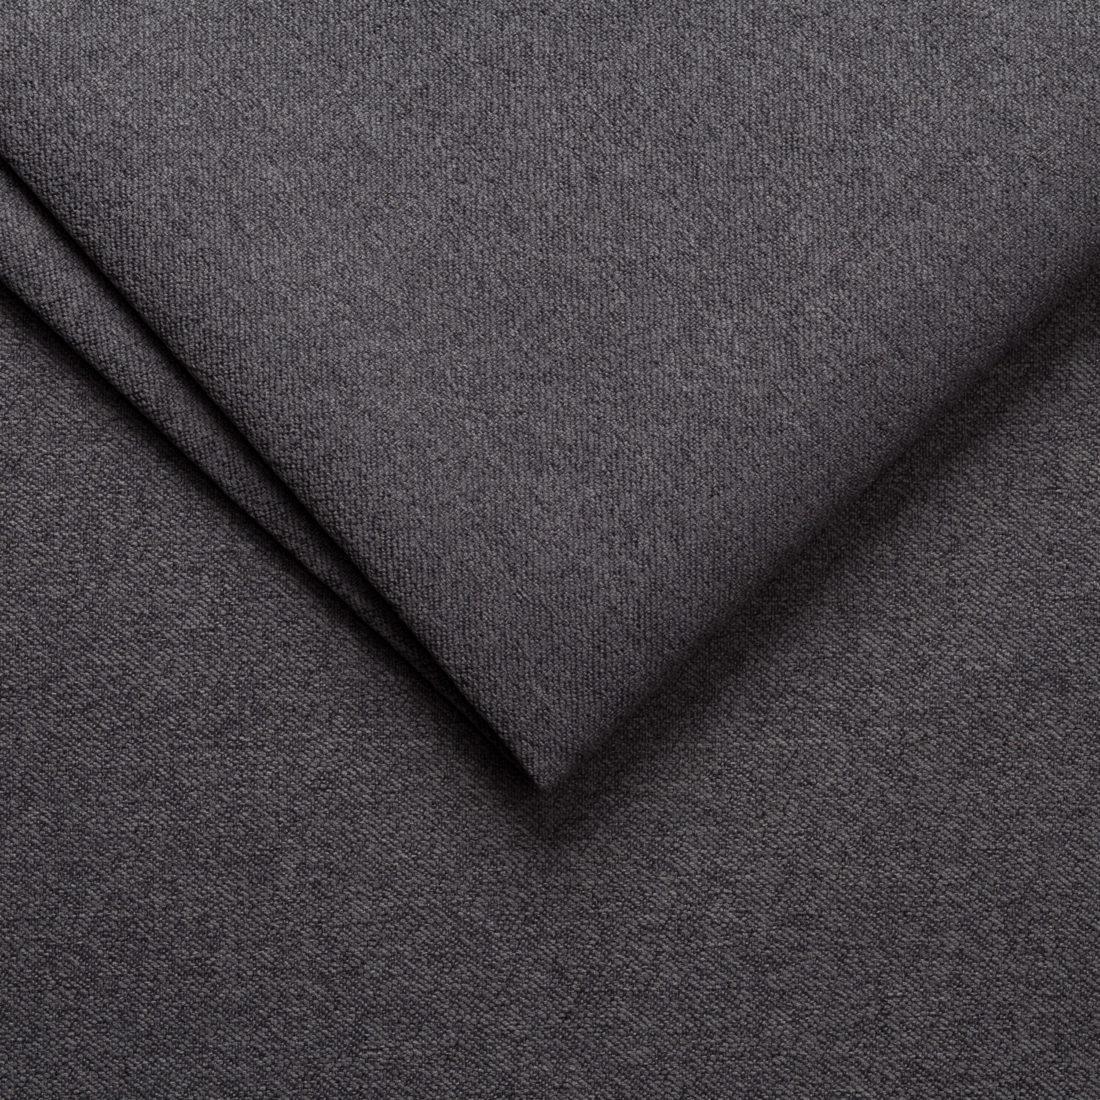 Мебельная ткань Evolution 17 Dark Grey, жаккард